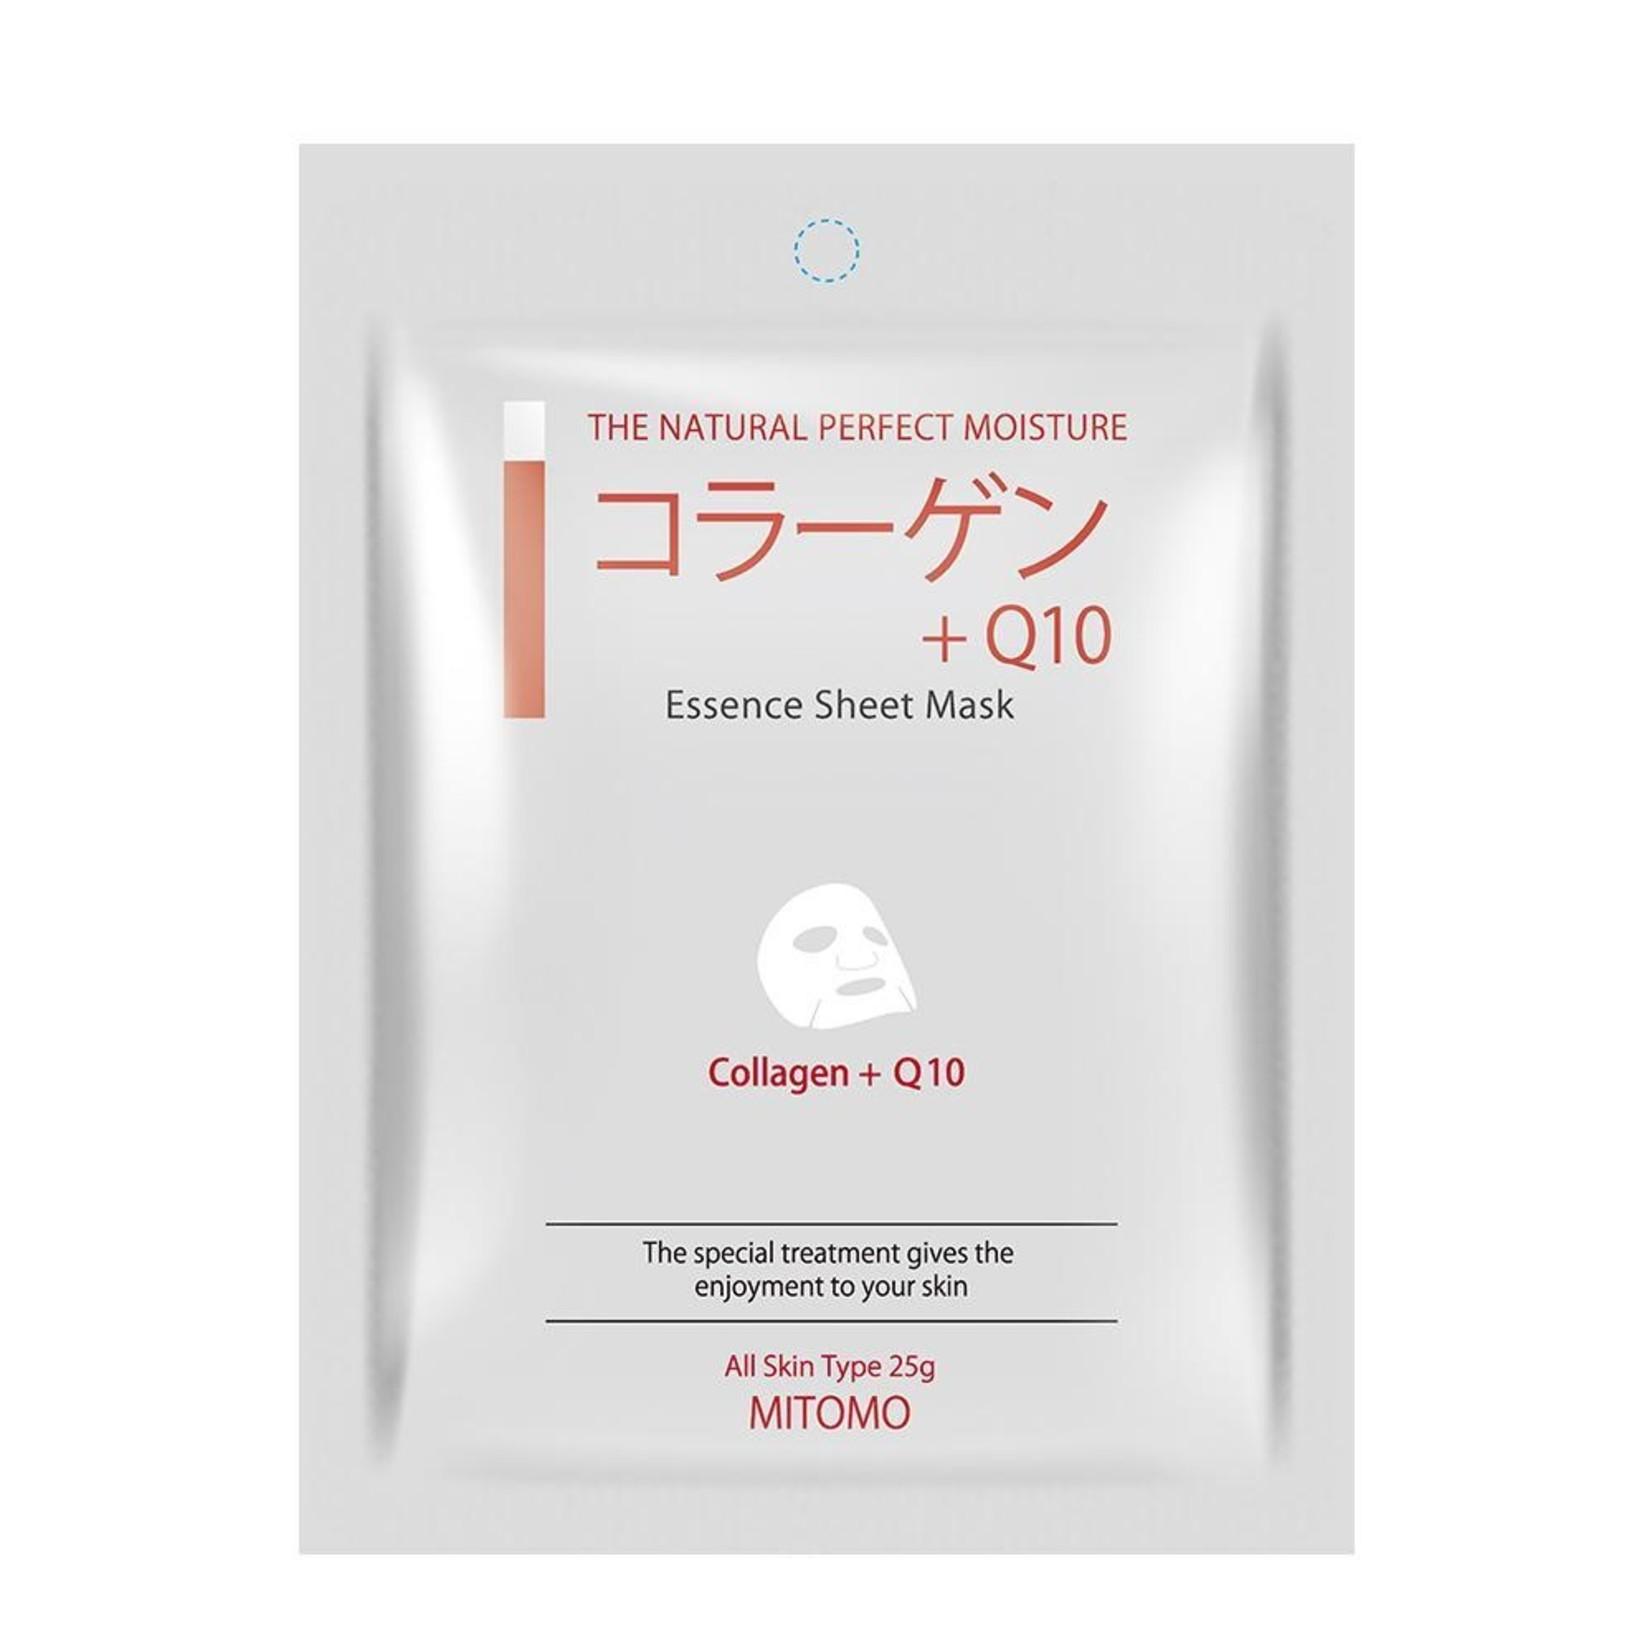 MITOMO Collagen + Q10 Elasticity Essence Mask